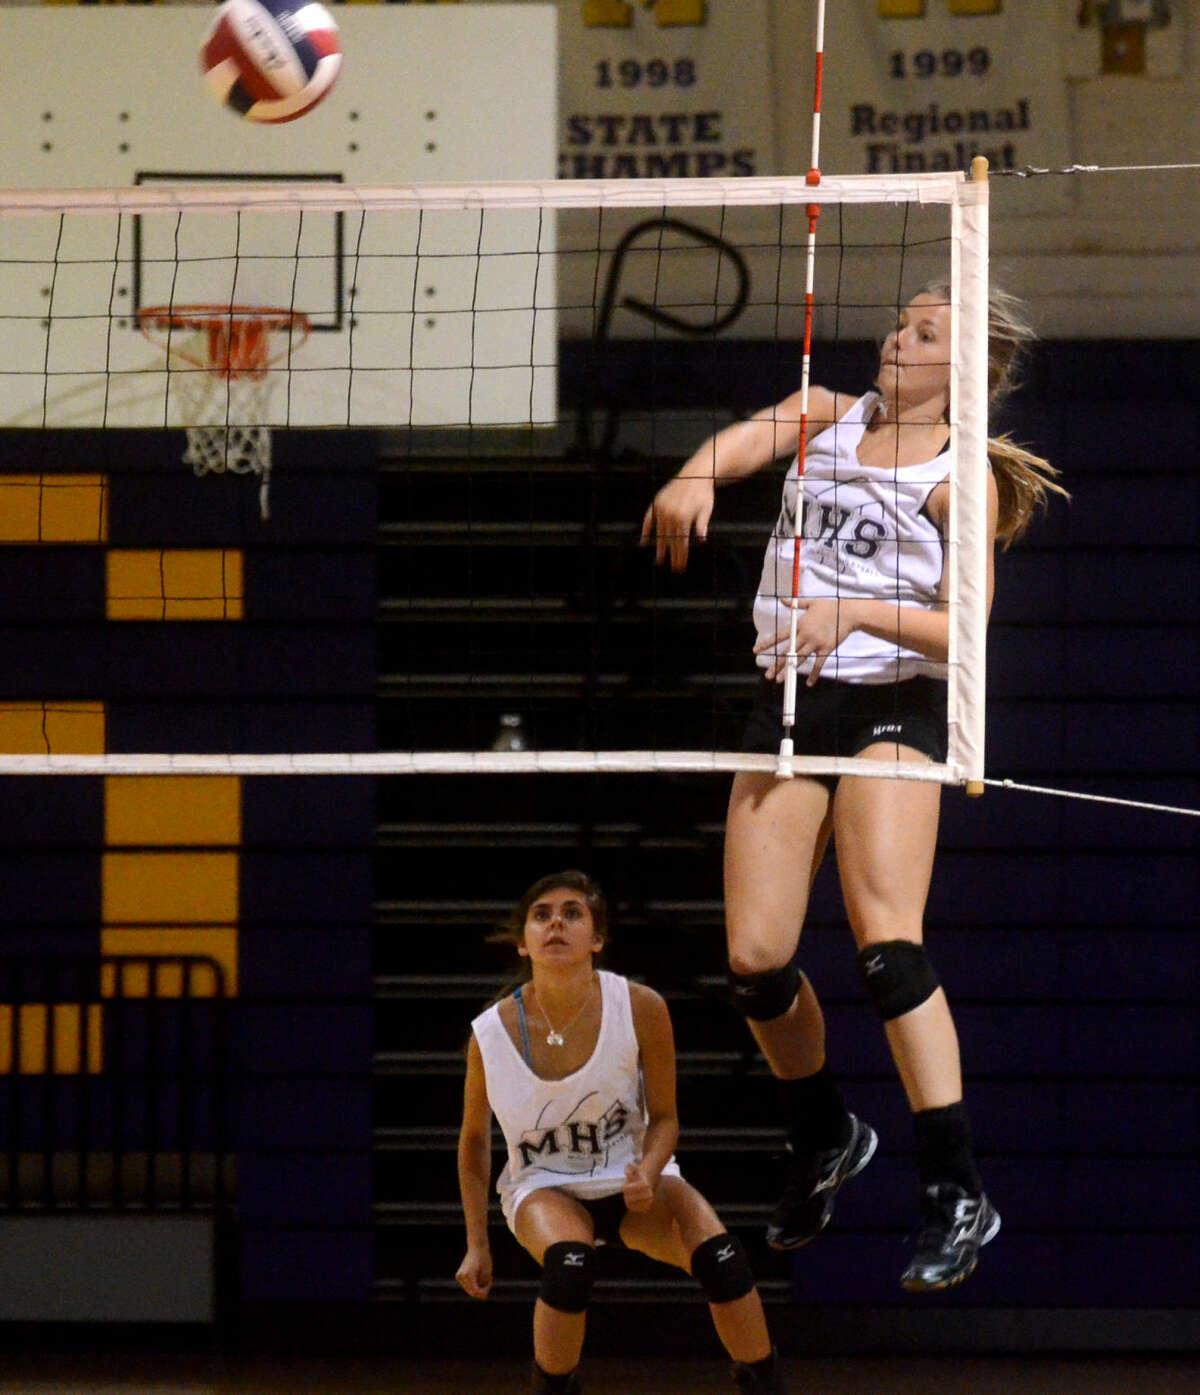 Midland High's Jenna Gillean hits during practice Wednesday at MHS. James Durbin/Reporter-Telegram